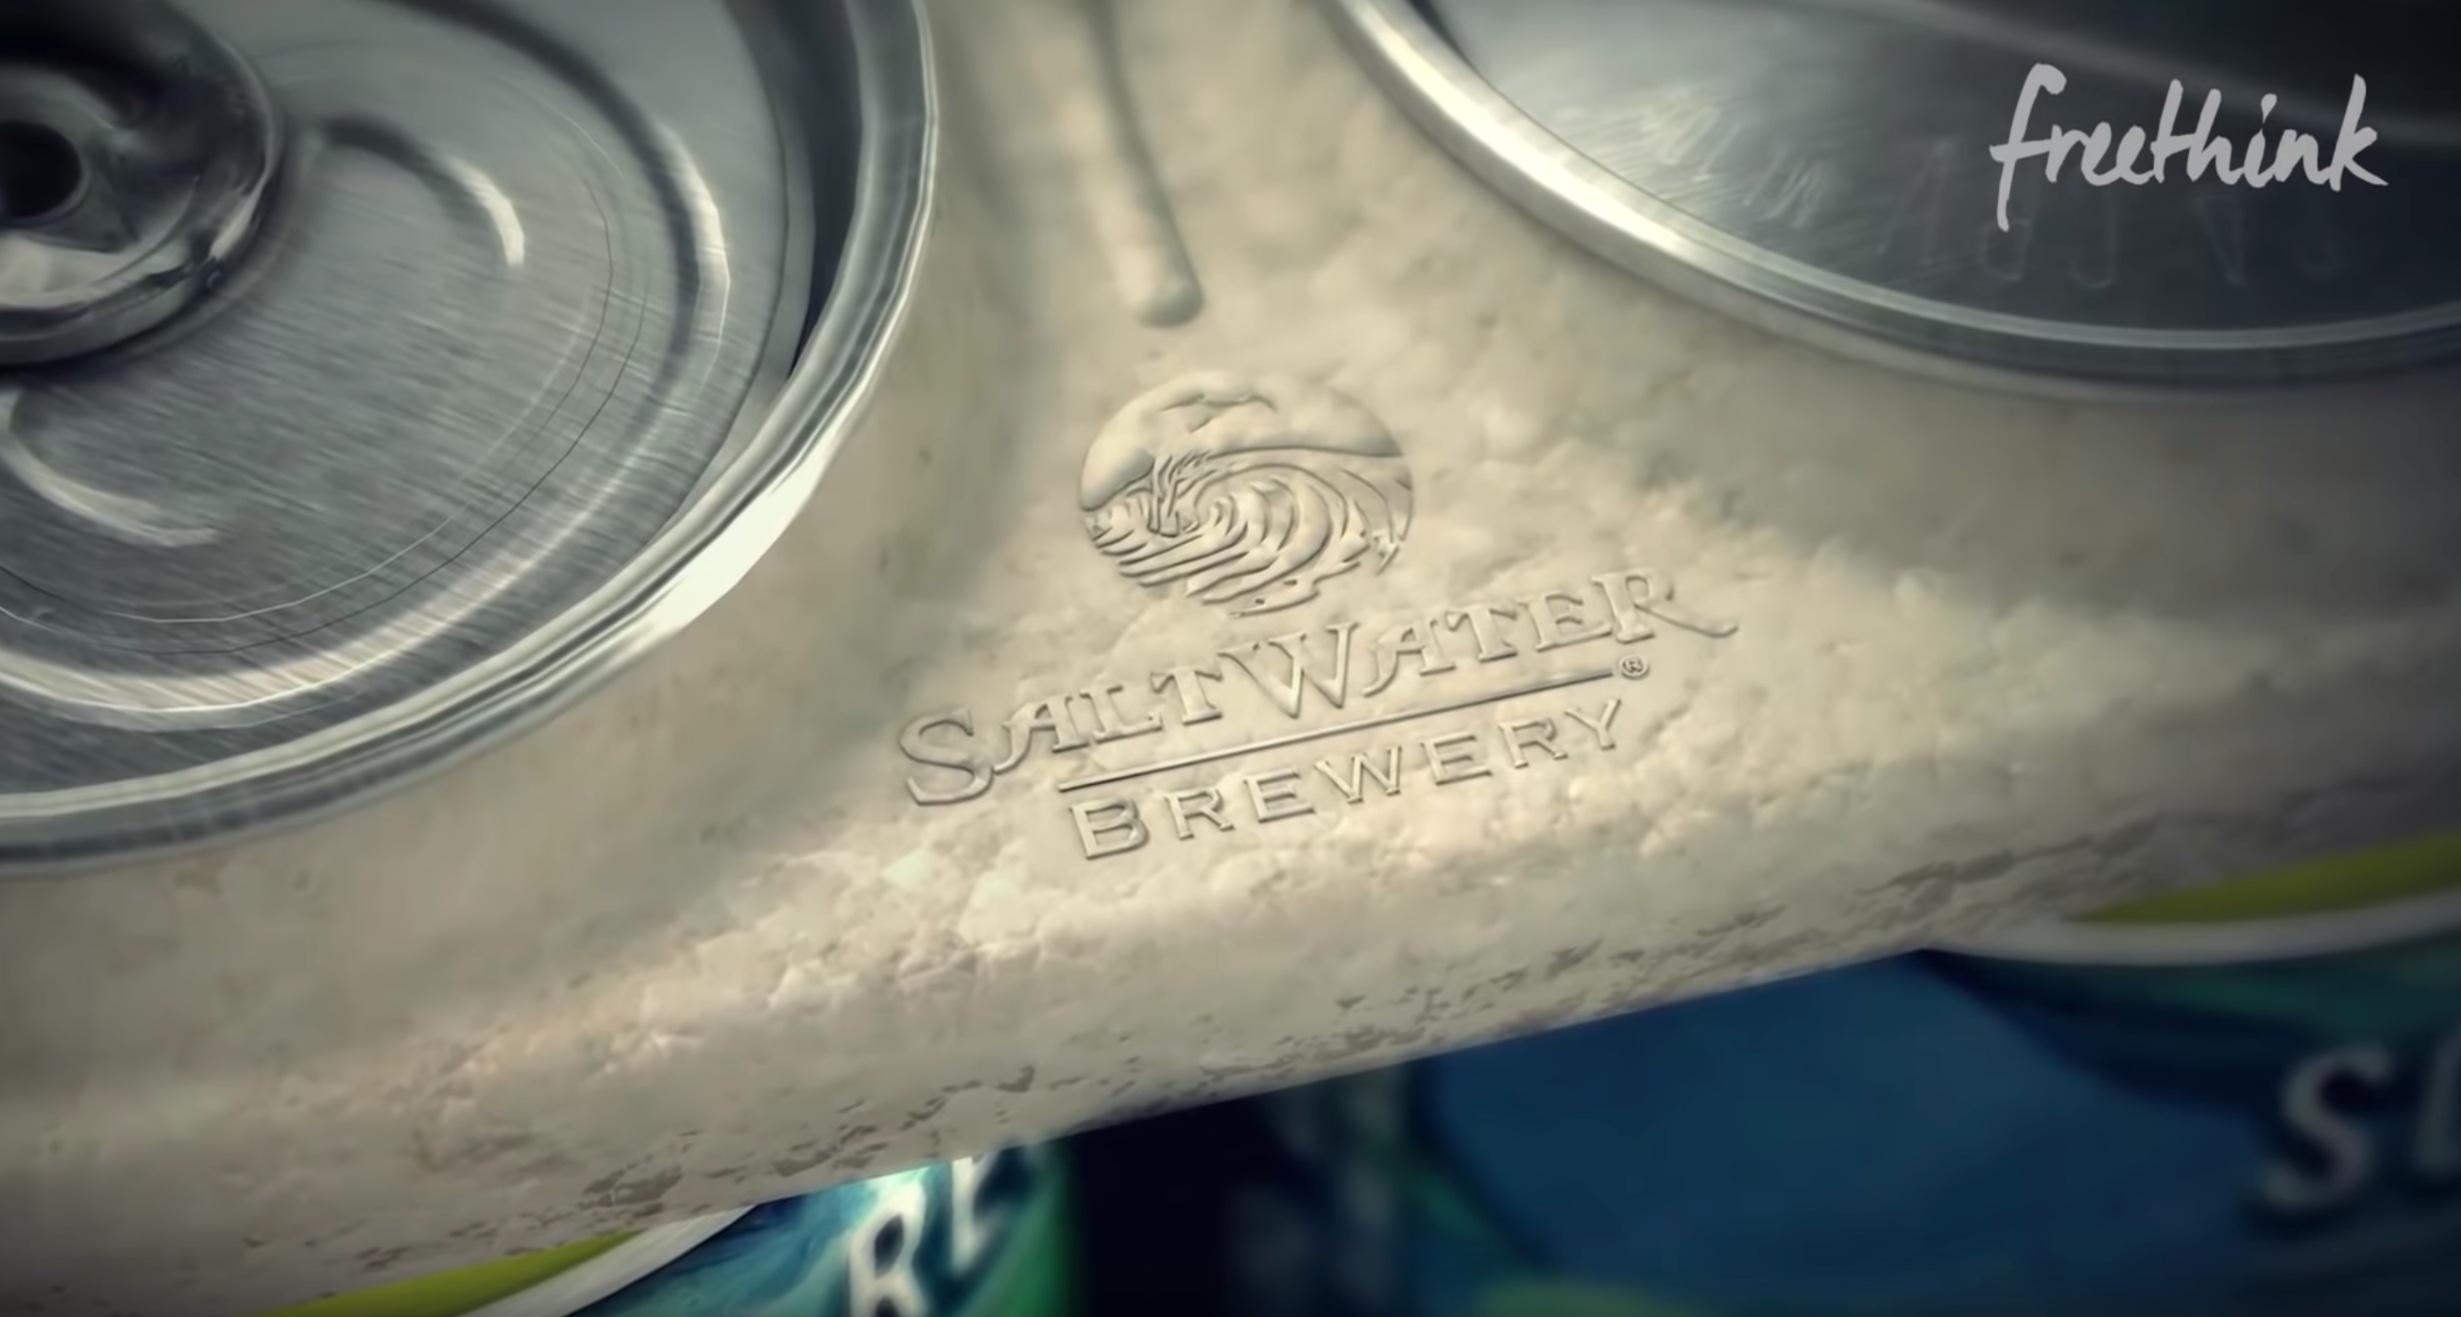 Freethink x Saltwater Brewery -